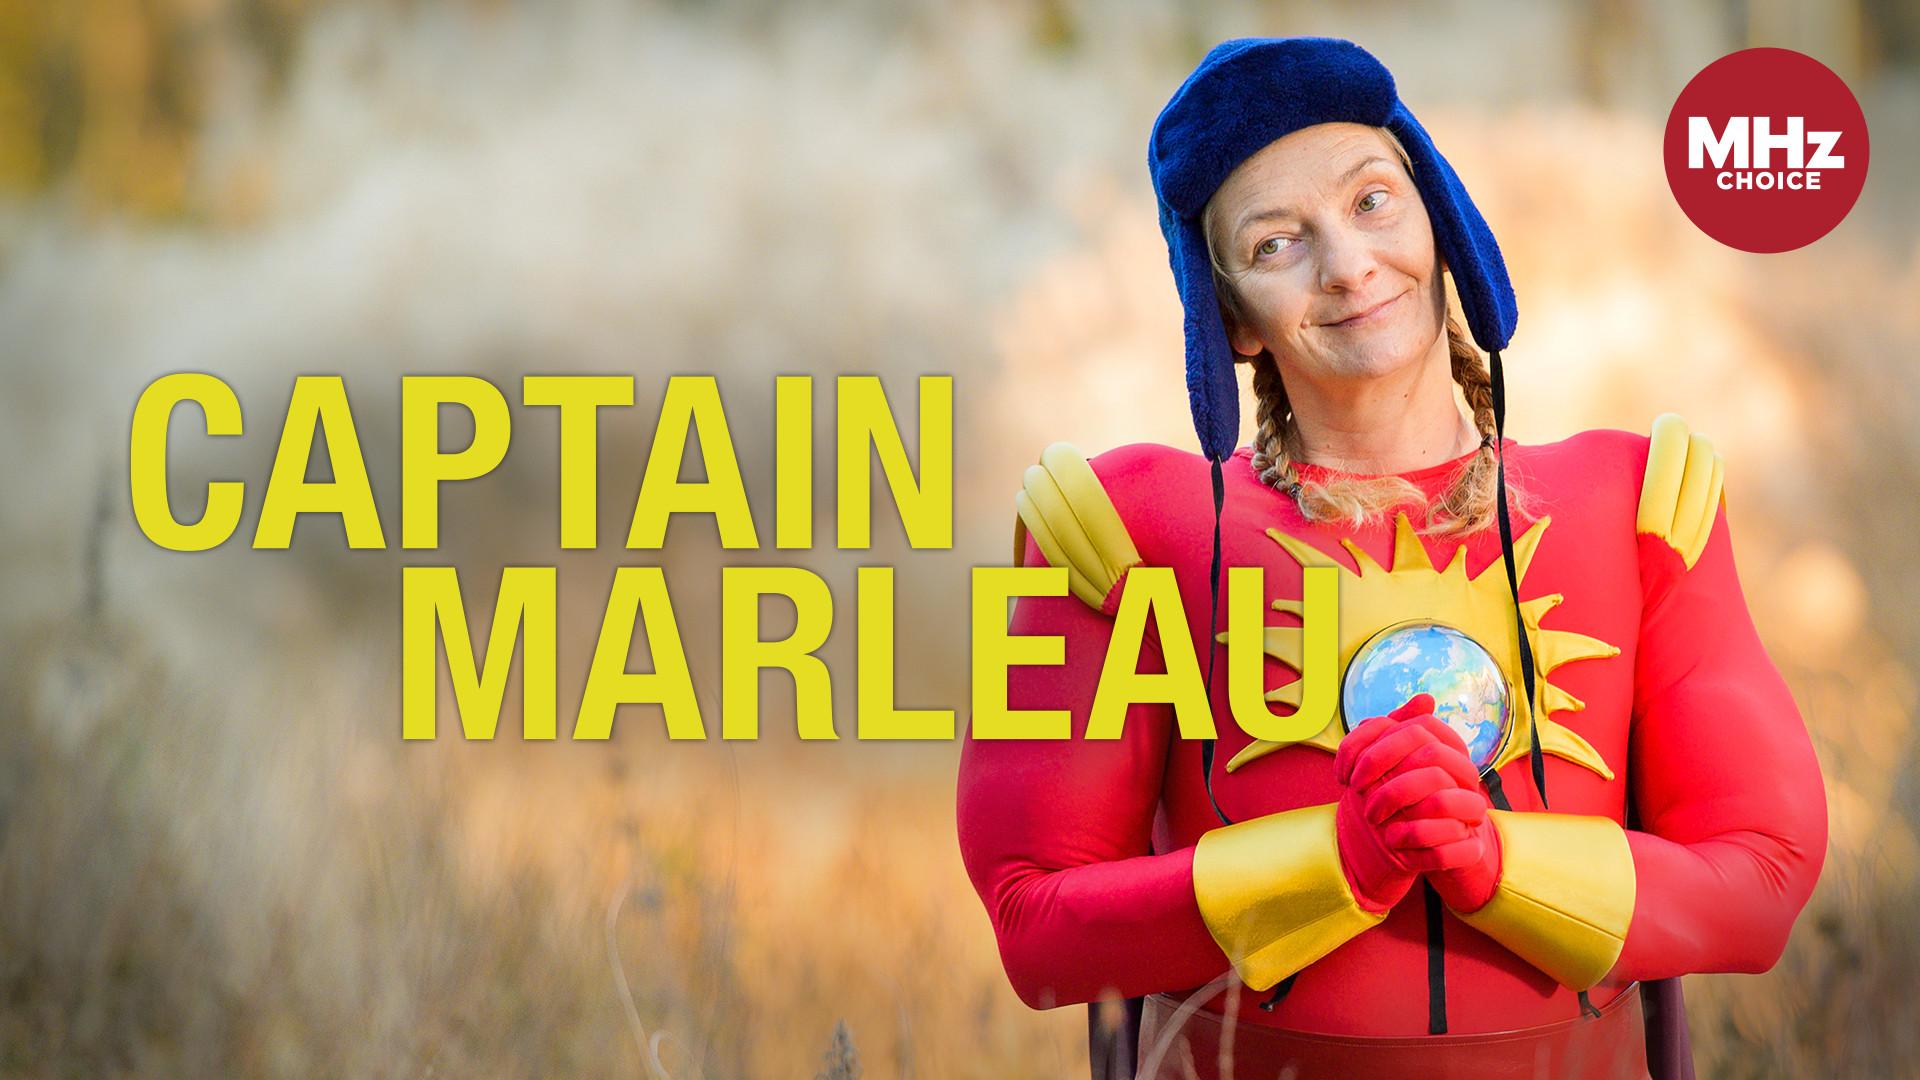 Captain Marleau